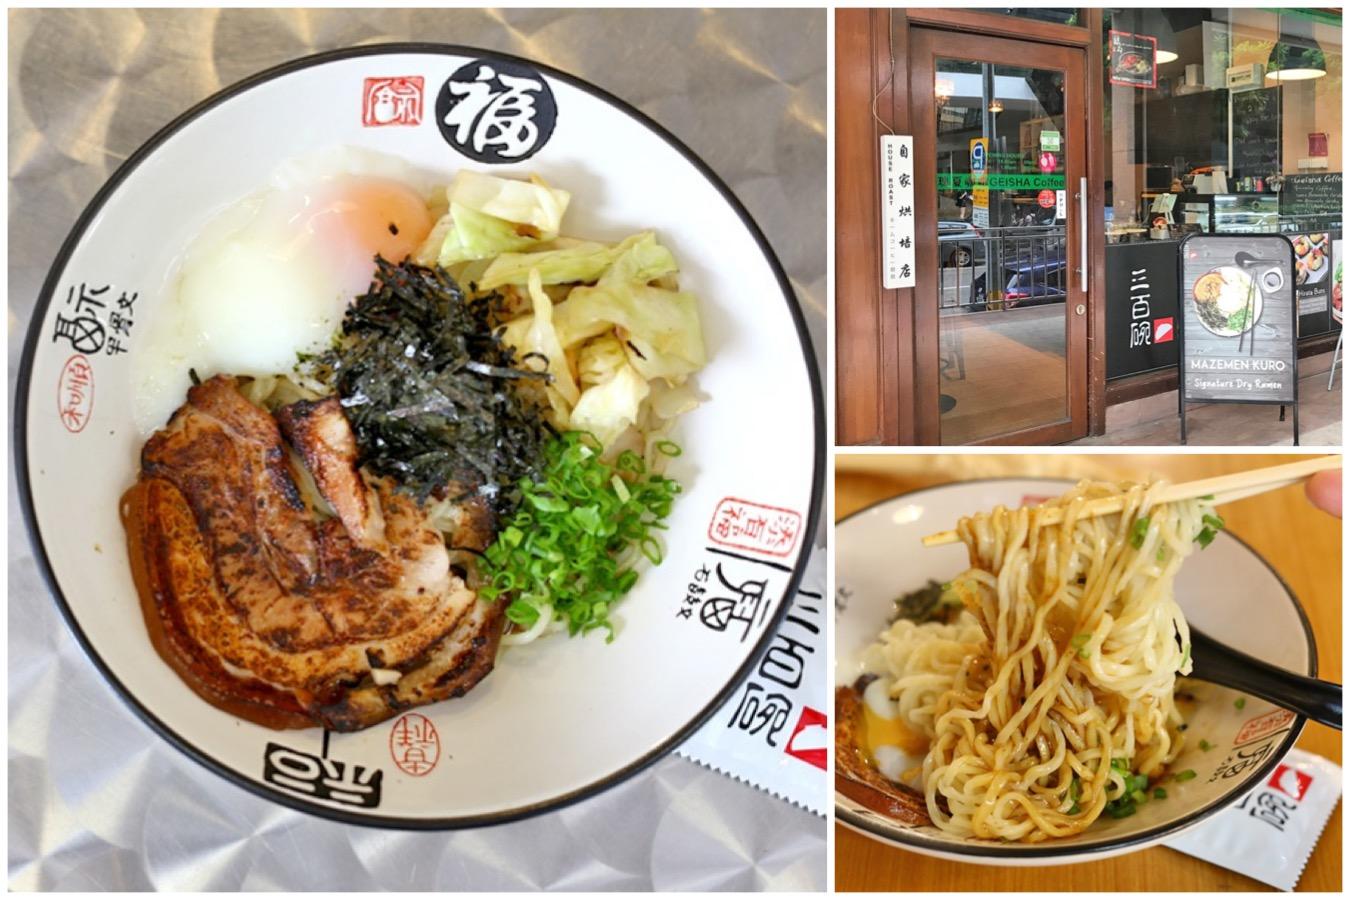 300 Boru 三百碗 - $6.90 Mazasoba Ramen Near Bugis. All Items Below $10 Each